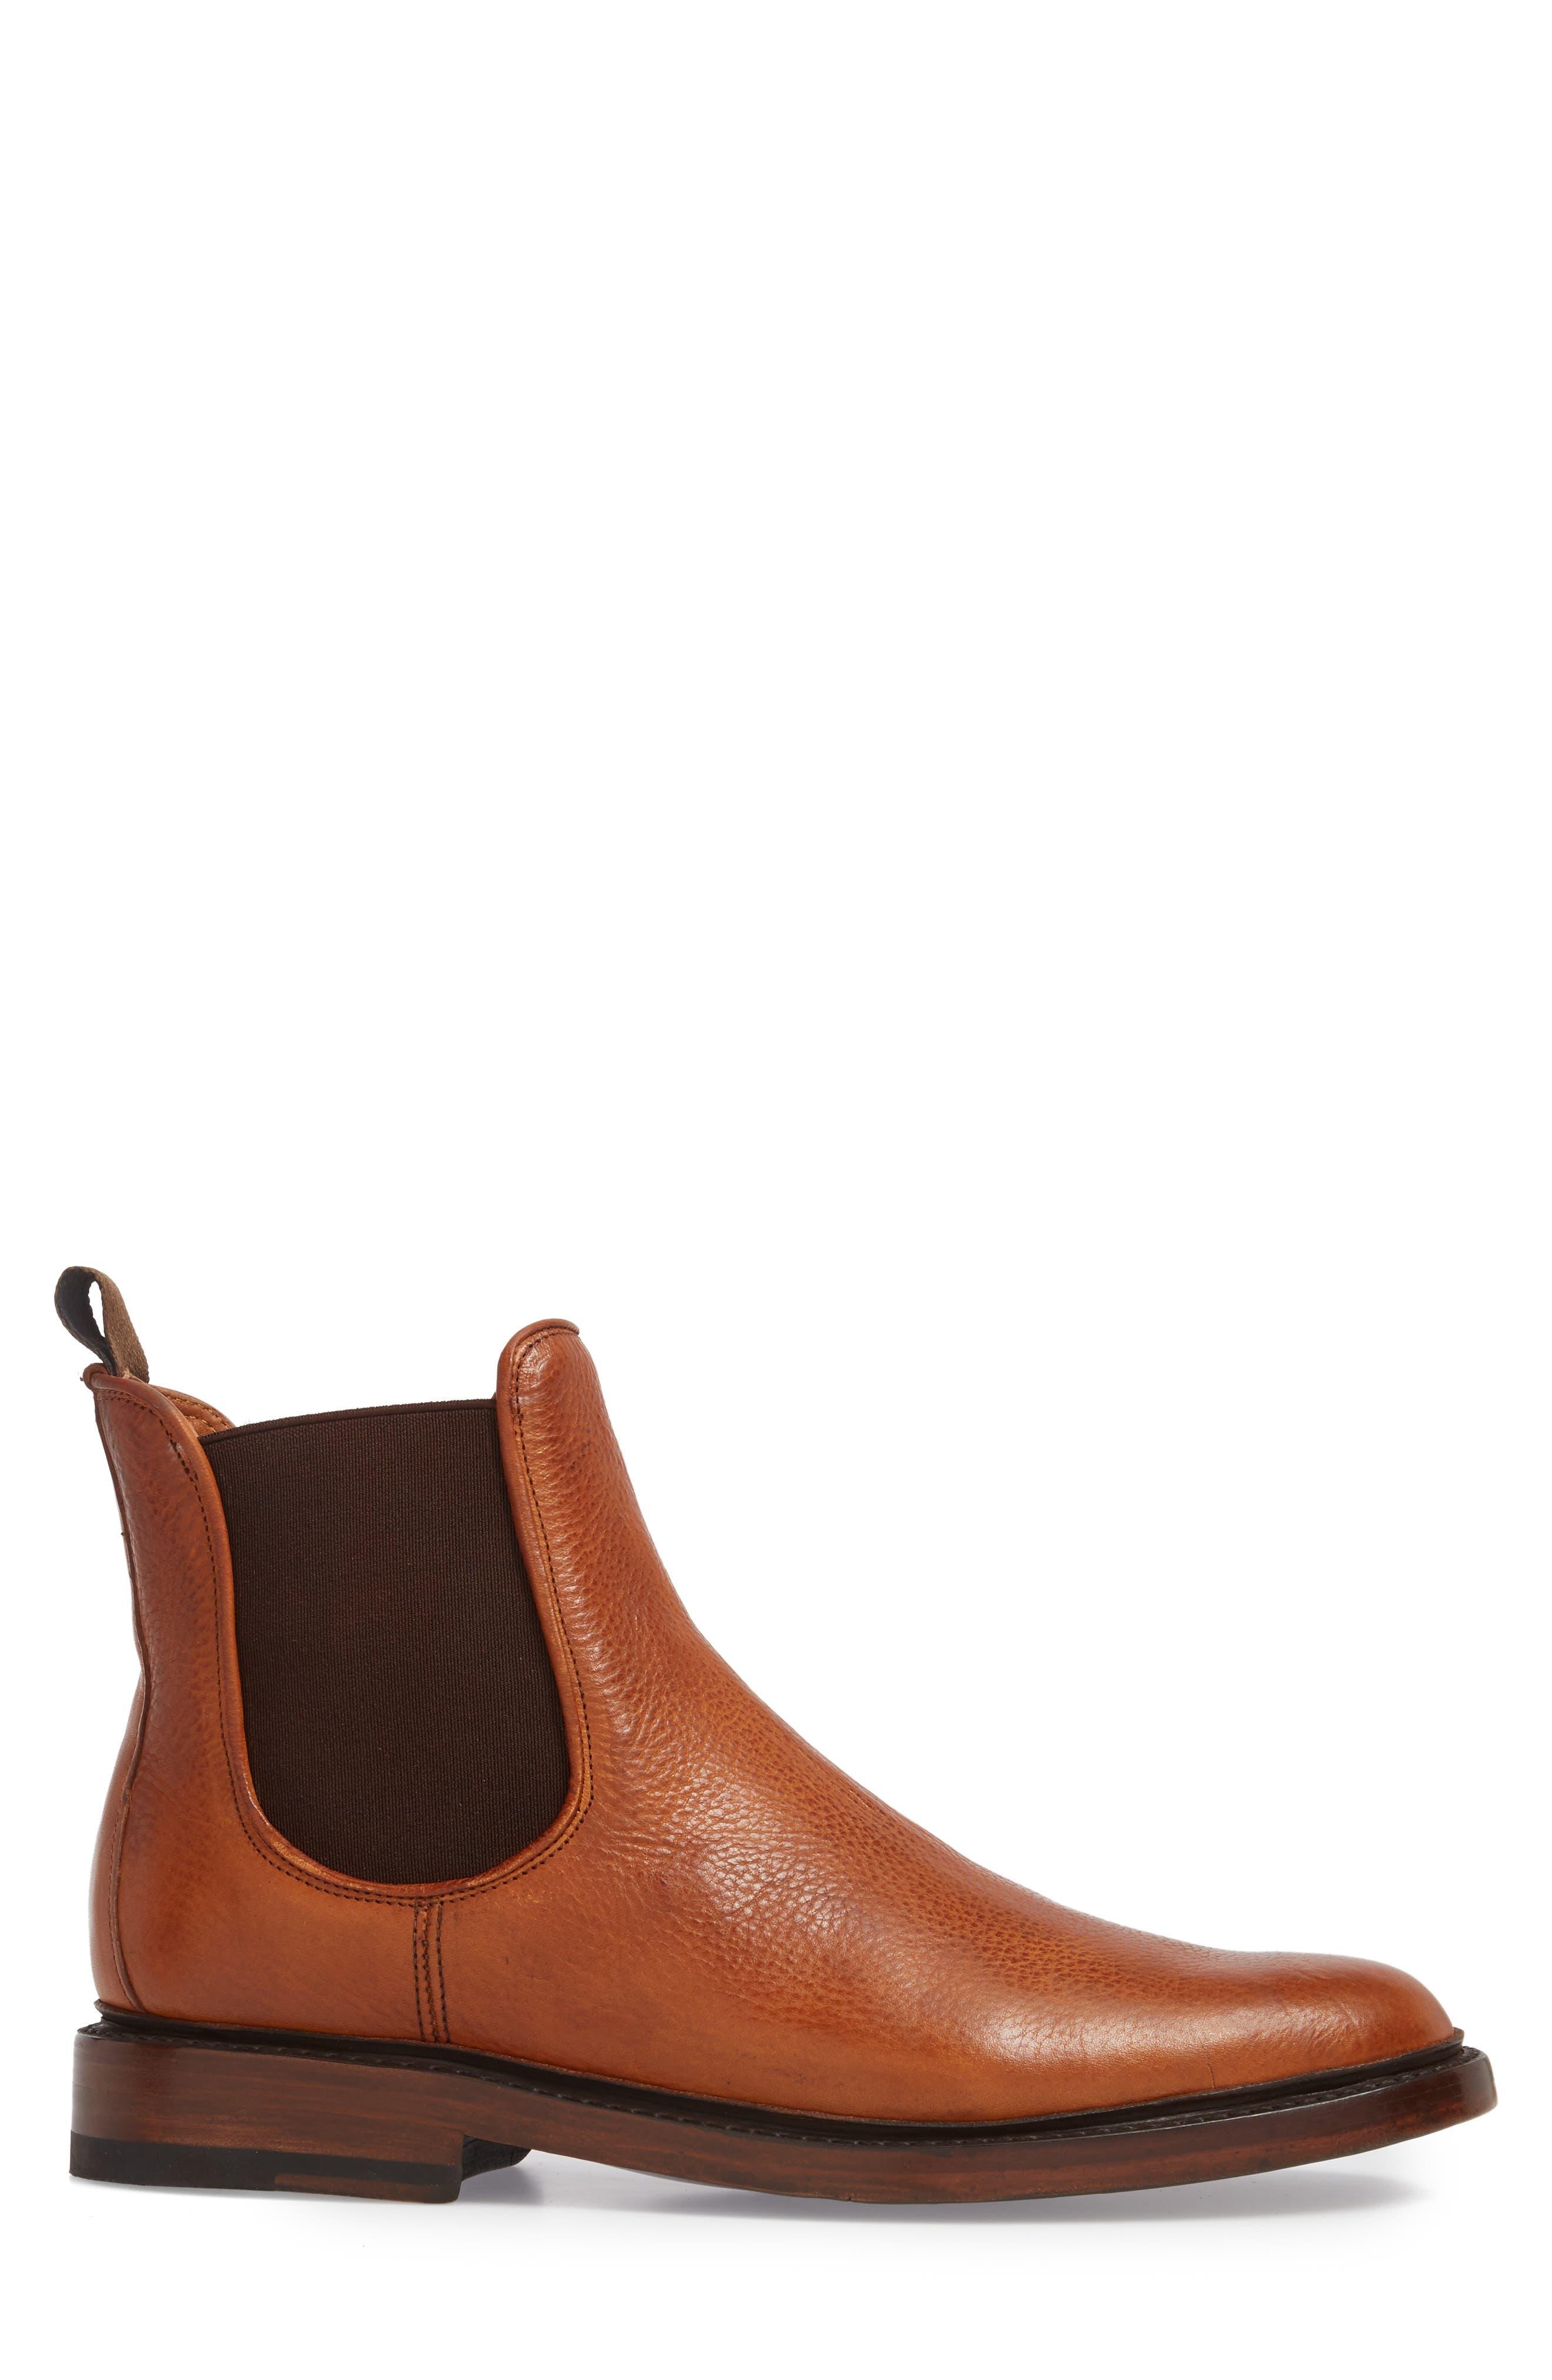 Jones Chelsea Boot,                             Alternate thumbnail 3, color,                             Caramel Leather